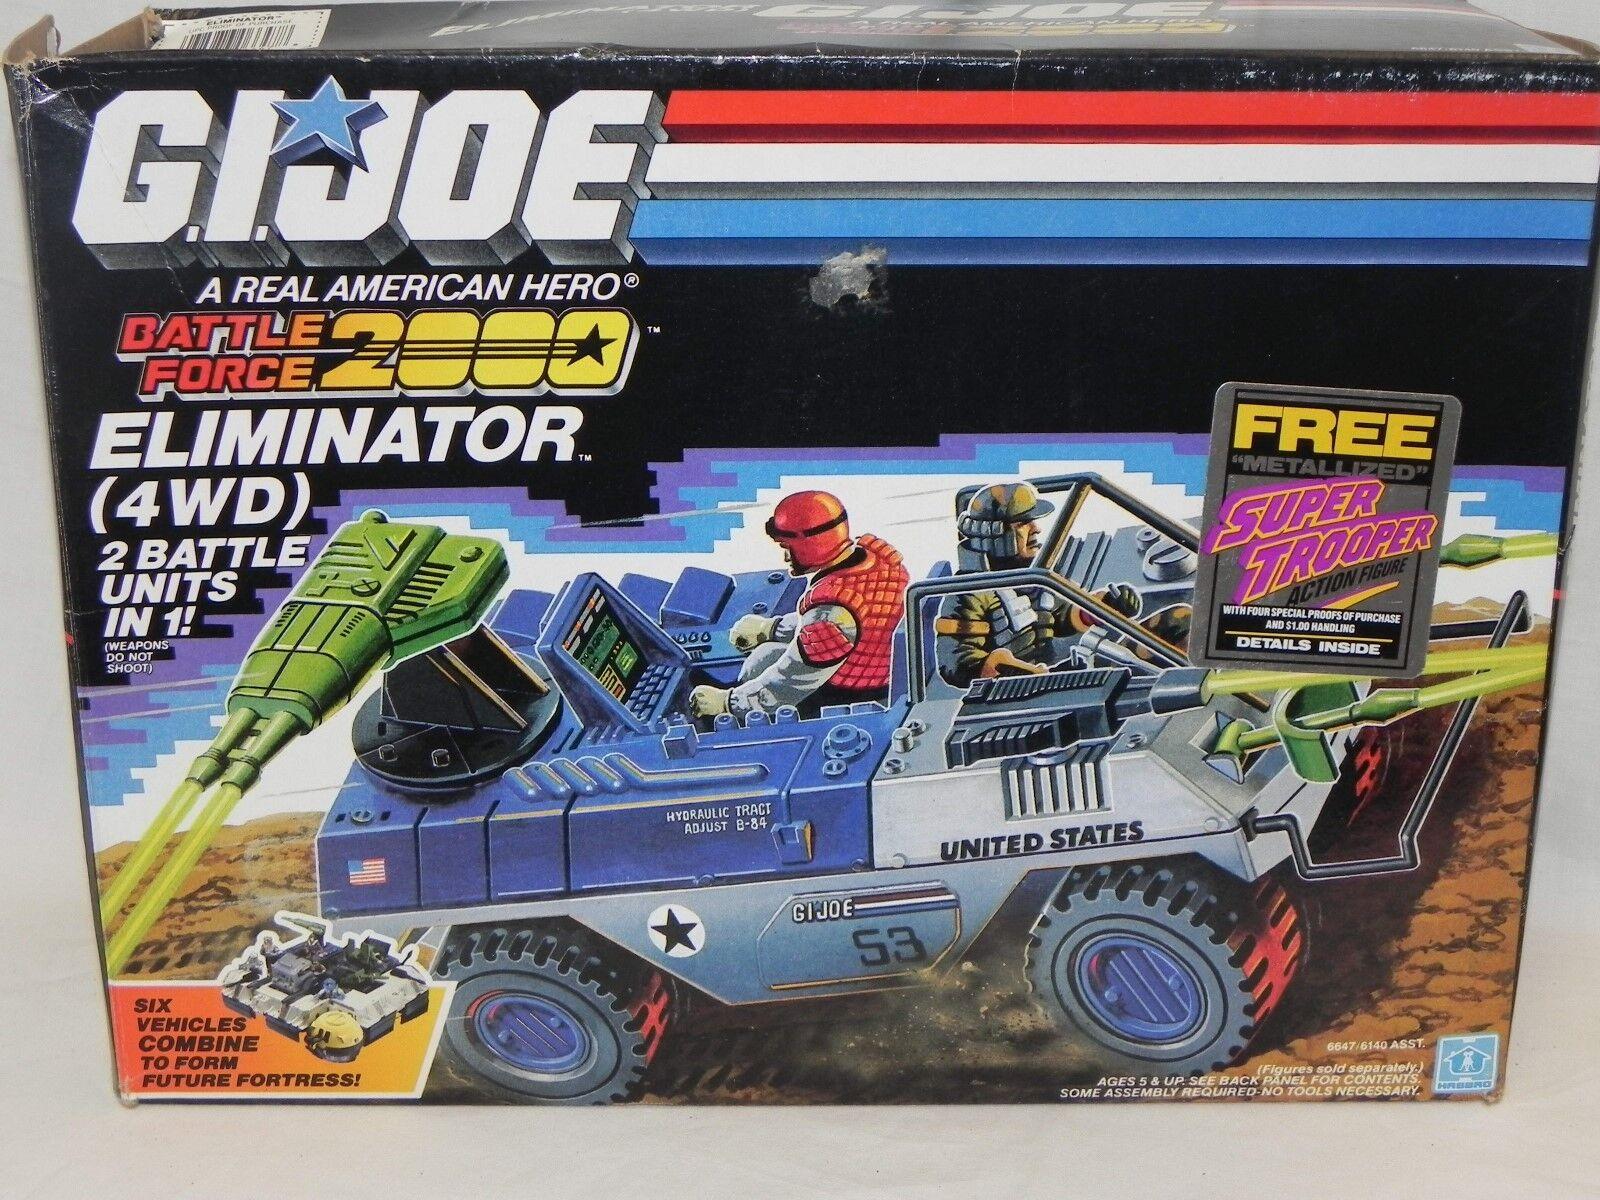 NEW Sealed 1987 GI Joe Battle Force 2000 Eliminator 4WD Vehicle 6647 6140 READ